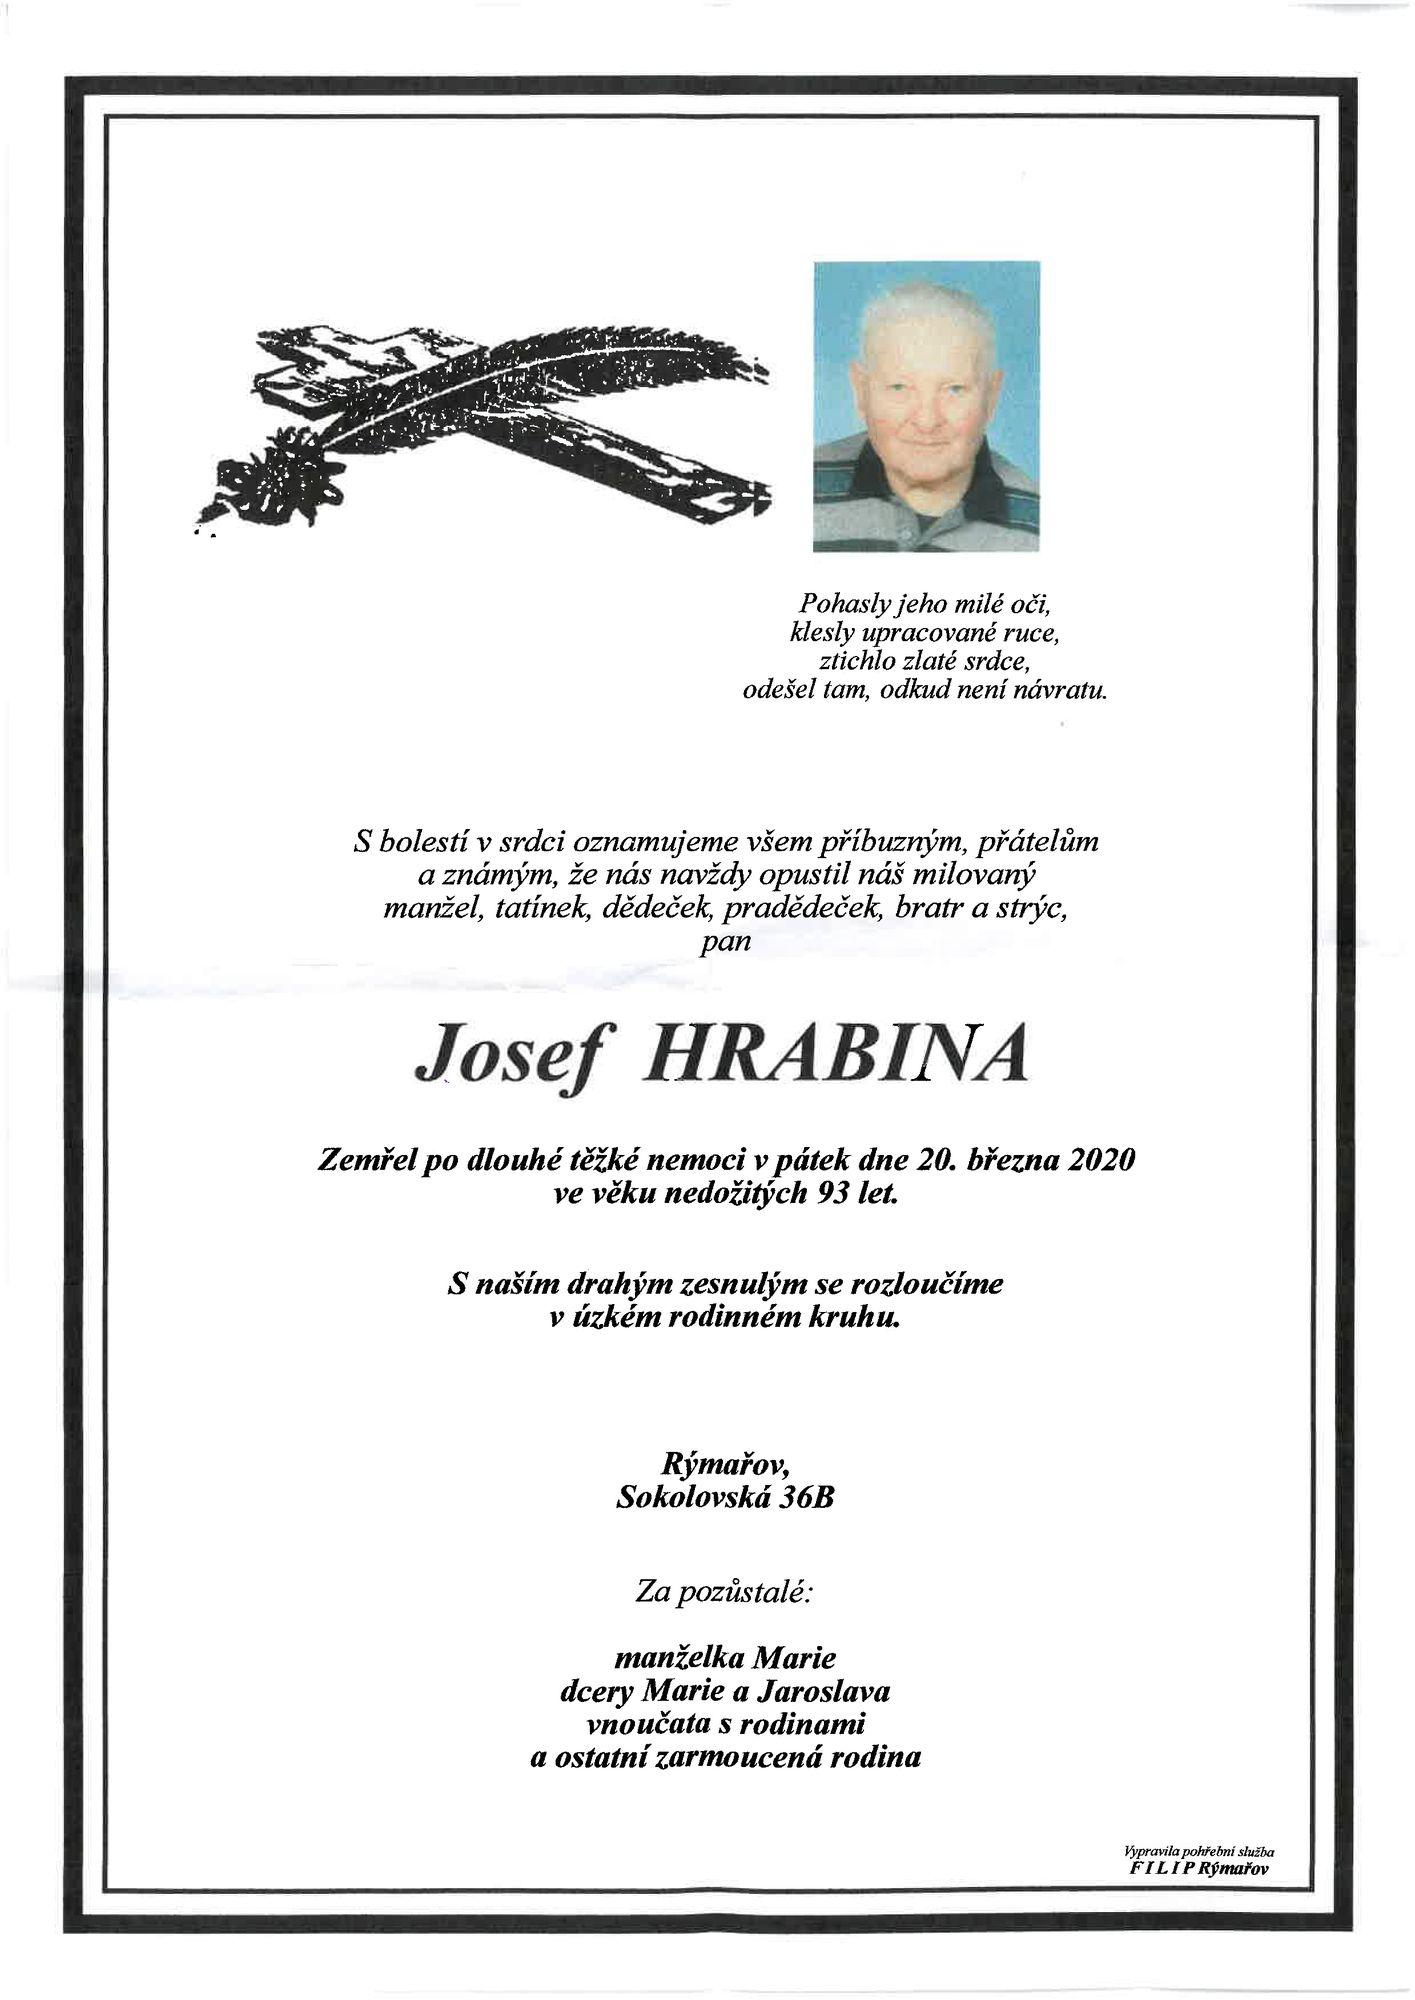 Josef Hrabina